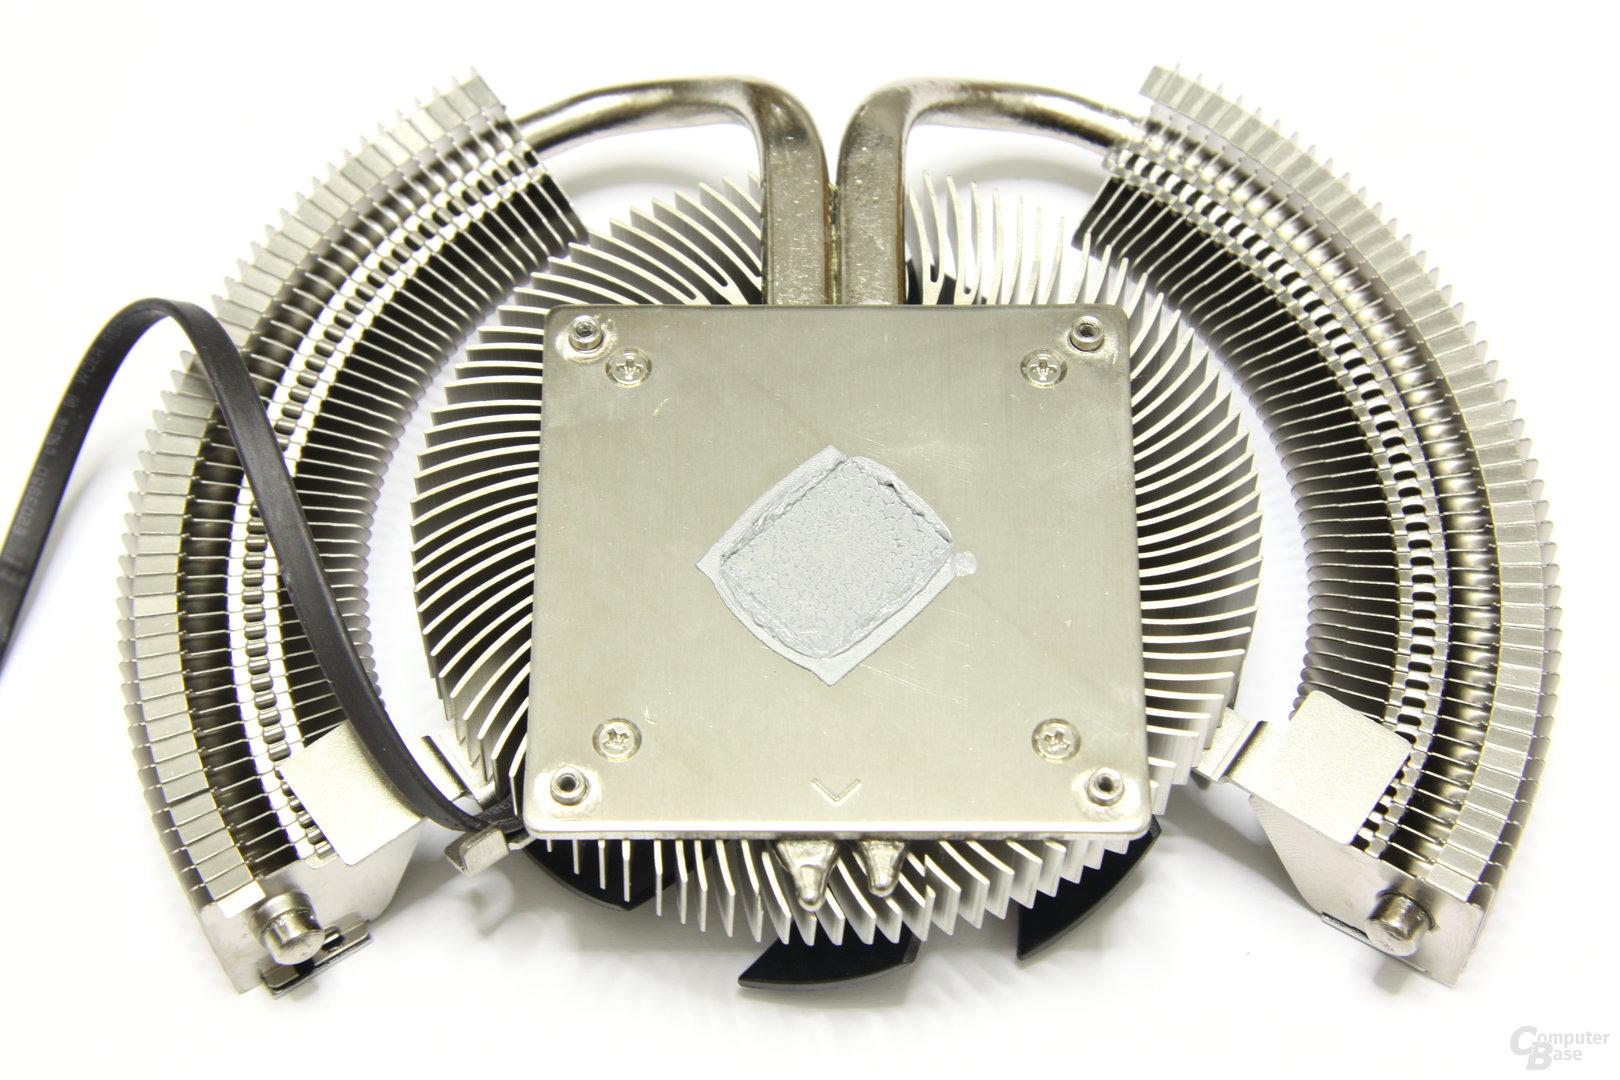 Radeon HD 6850 Power Edition OC Kühlerrückseite